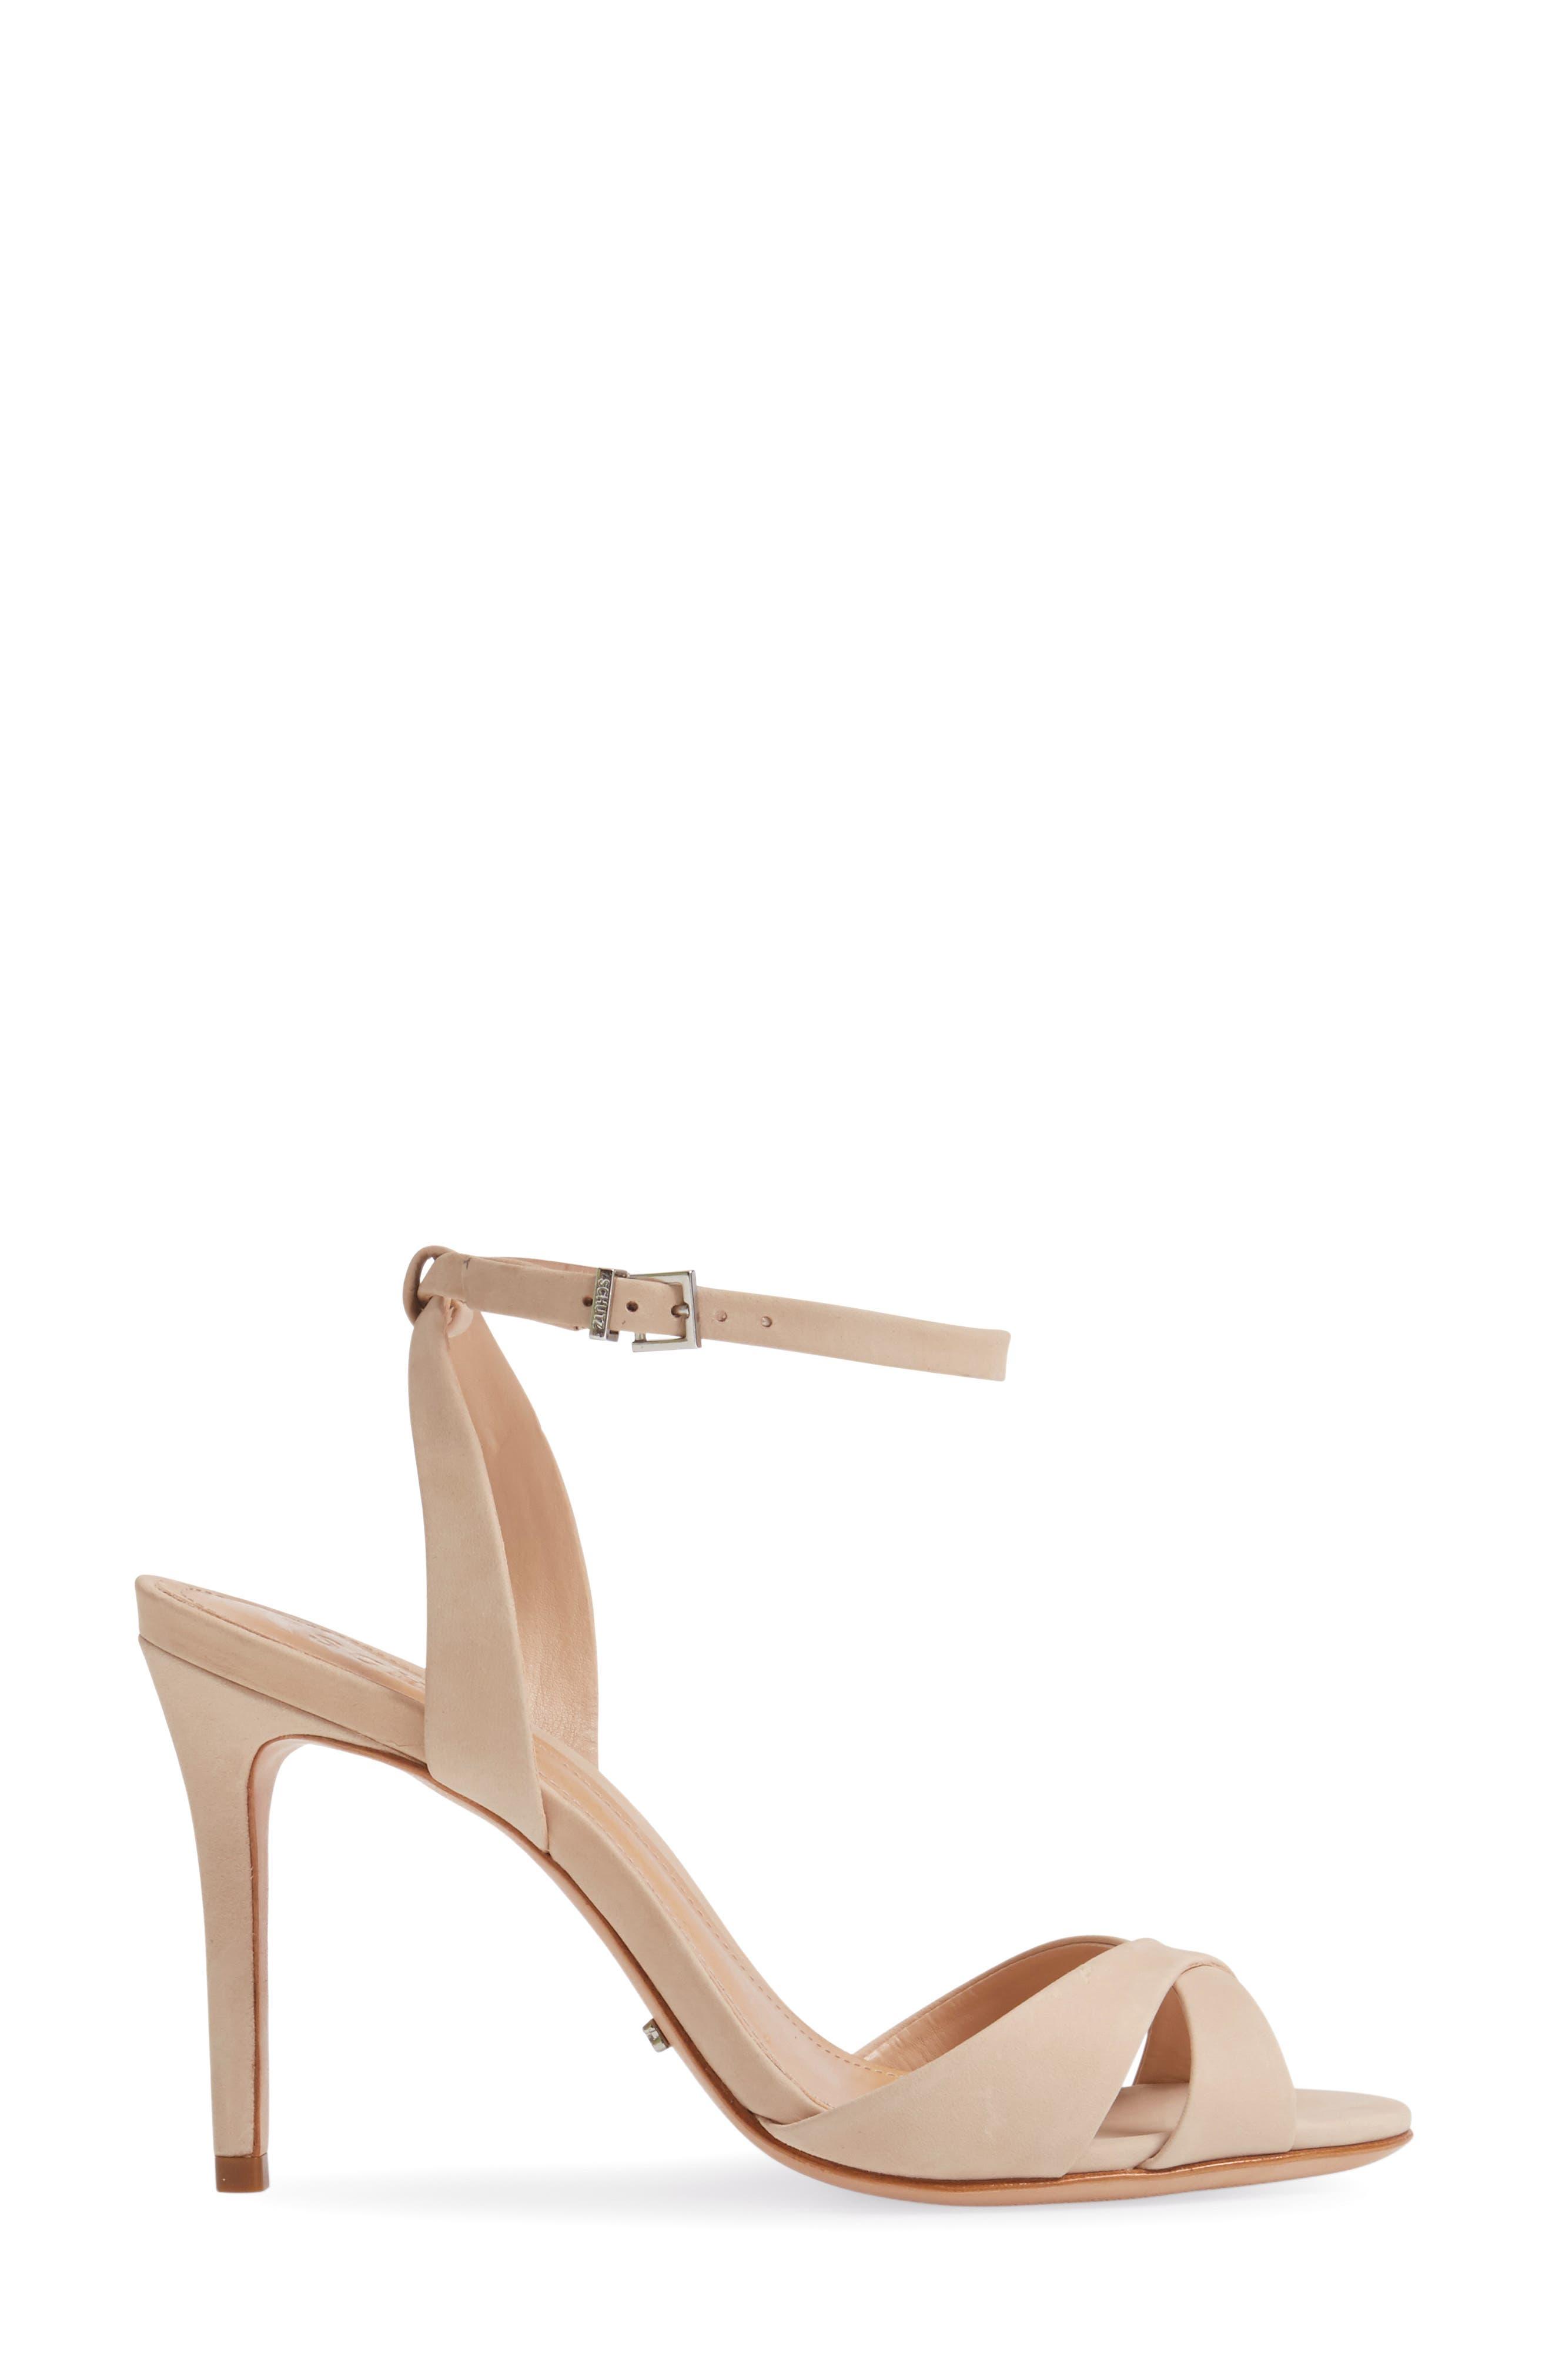 Olyvia Cross Toe Sandal,                             Alternate thumbnail 6, color,